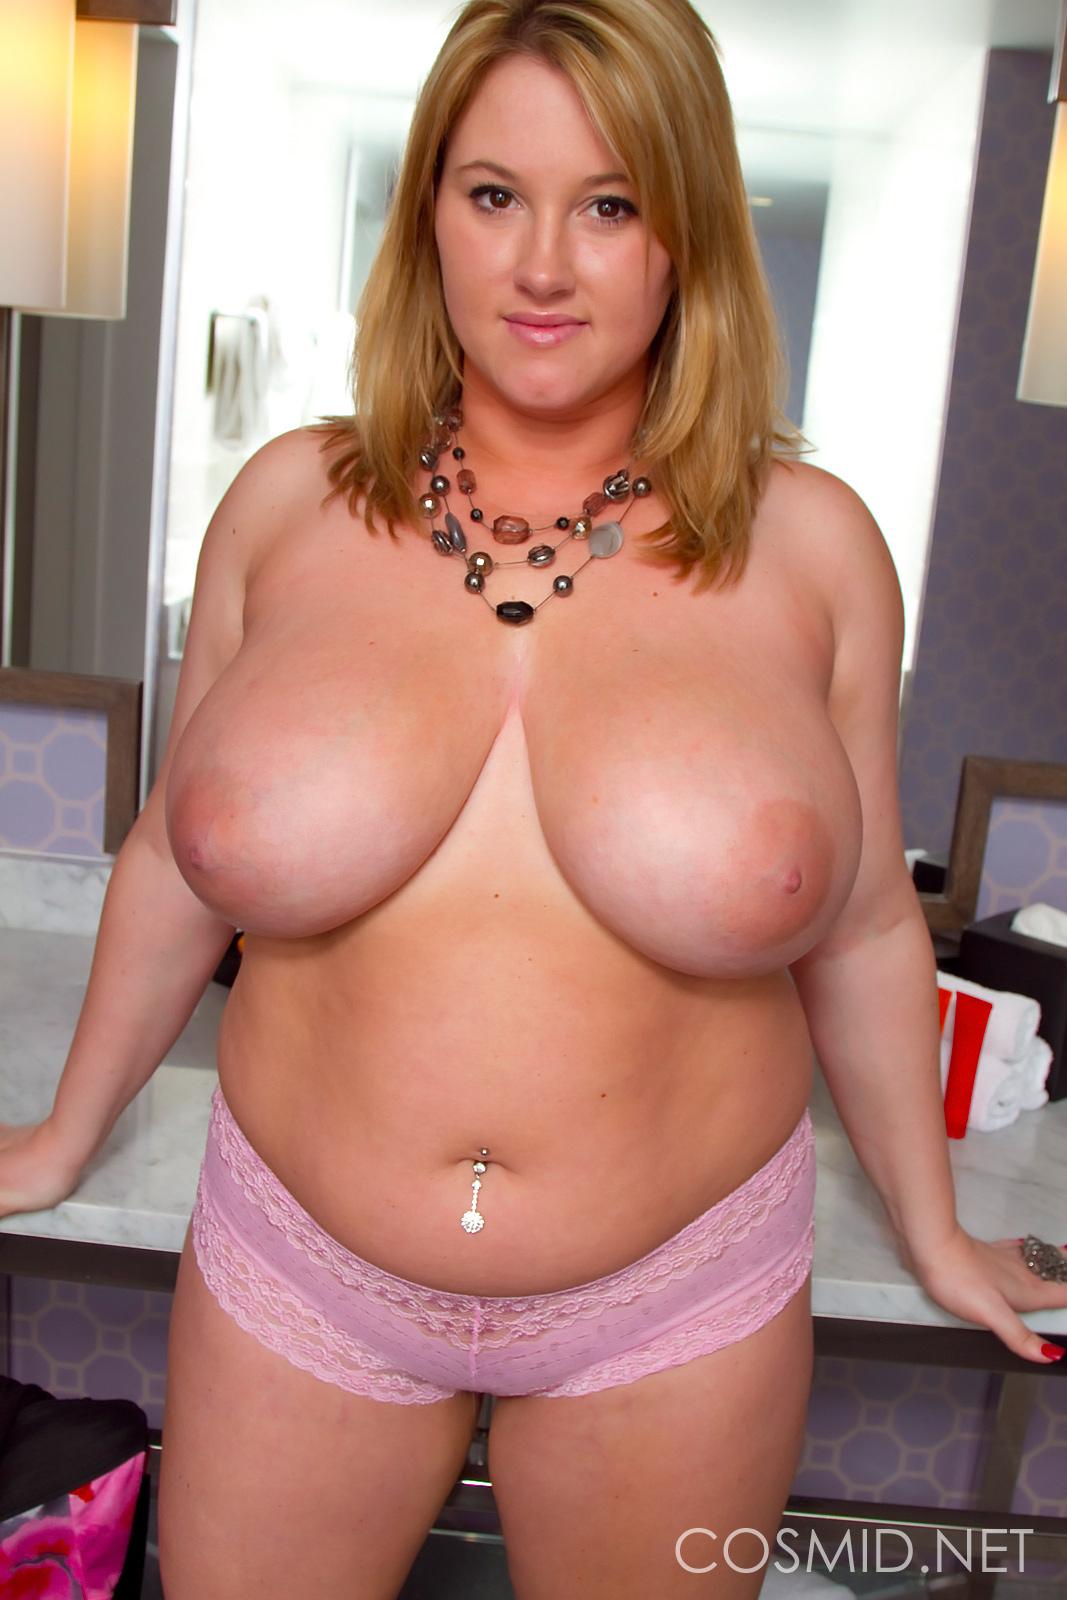 image Hayley marie norman busty boobs in crash scandalplanetcom